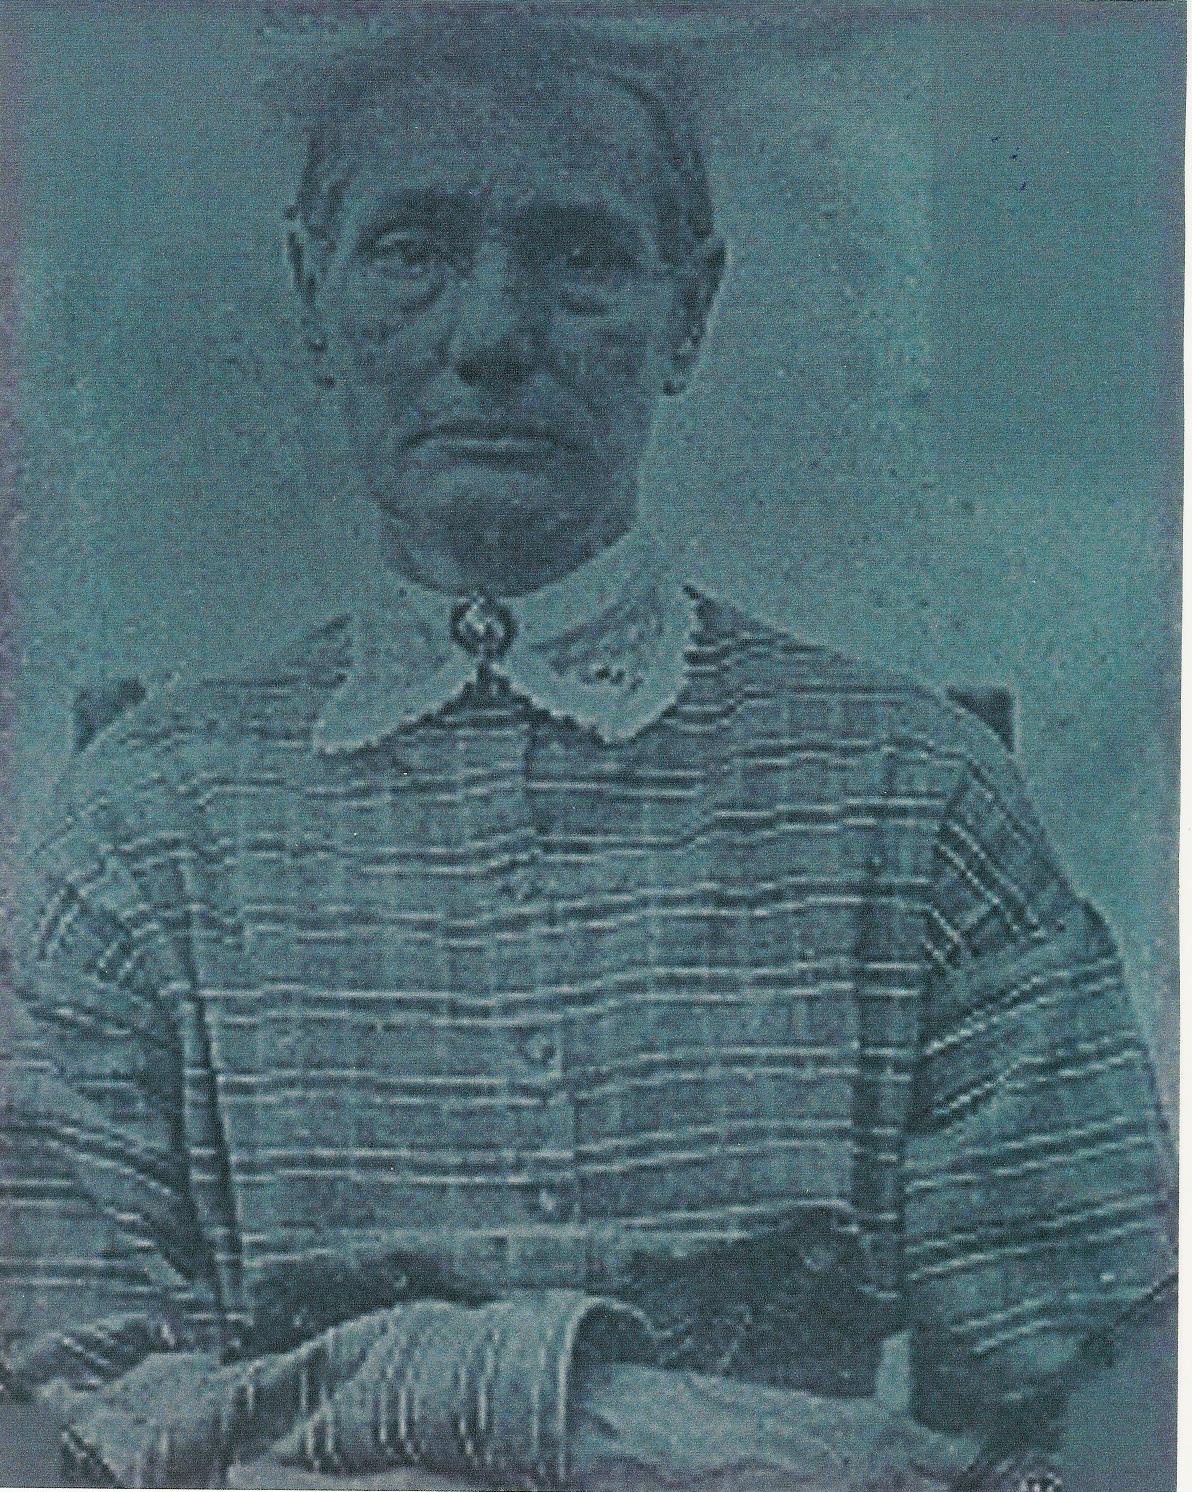 Claiborne Blanton